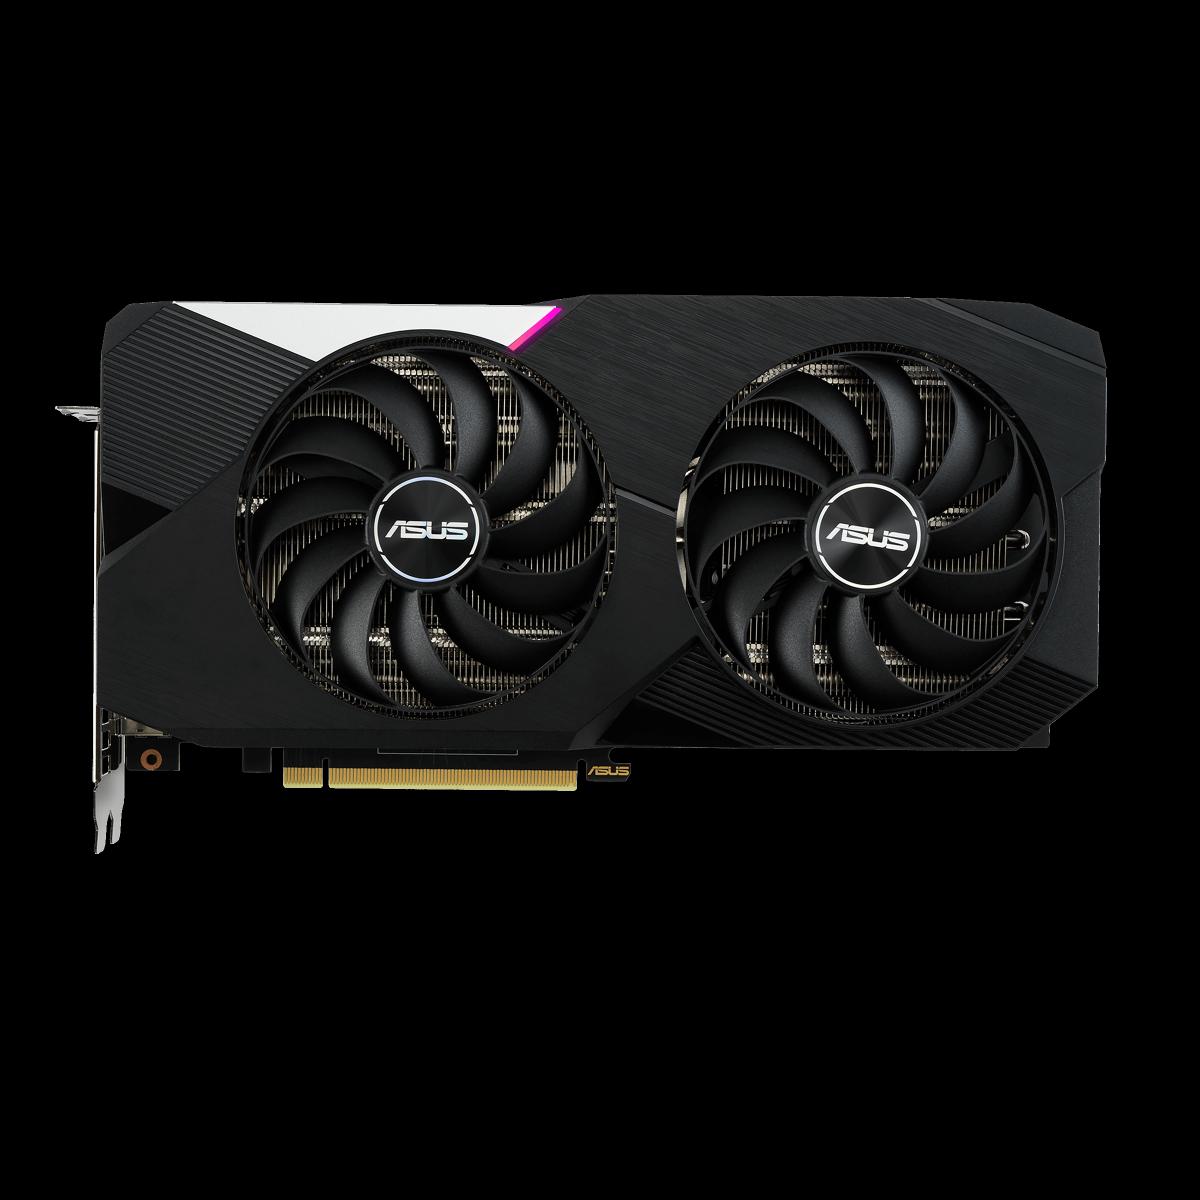 Placa de Vídeo Asus Geforce RTX 3060 Ti DUAL OC, 8GB GDDR6, 256bit, DUAL-RTX3060TI-O8G